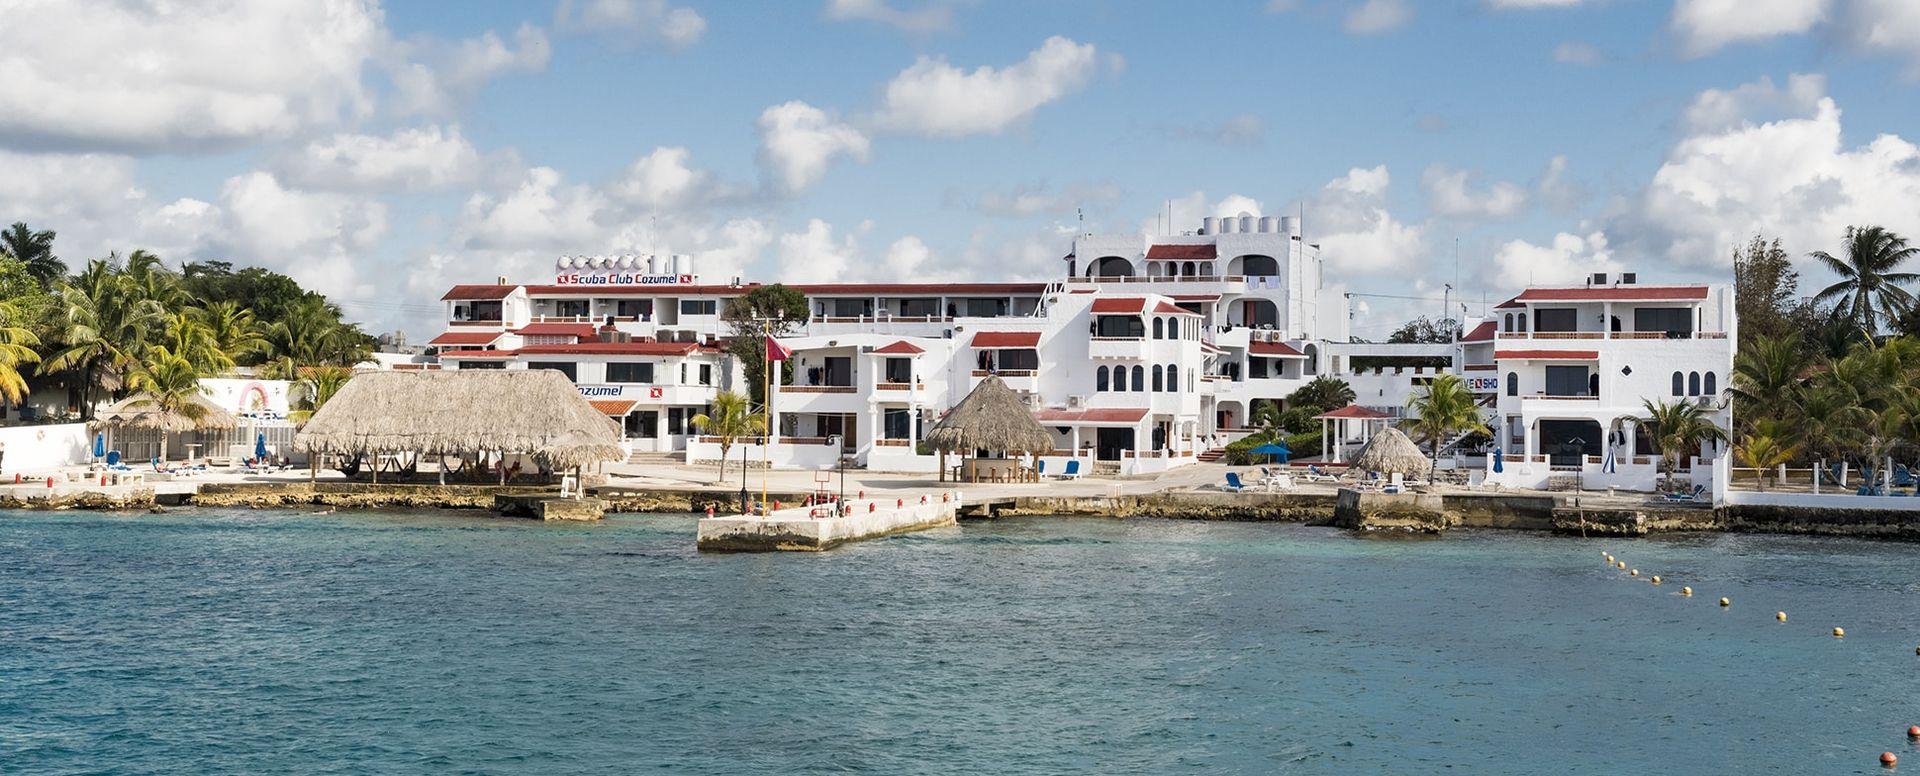 Resort Report: Scuba Club Cozumel   Caradonna Adventures